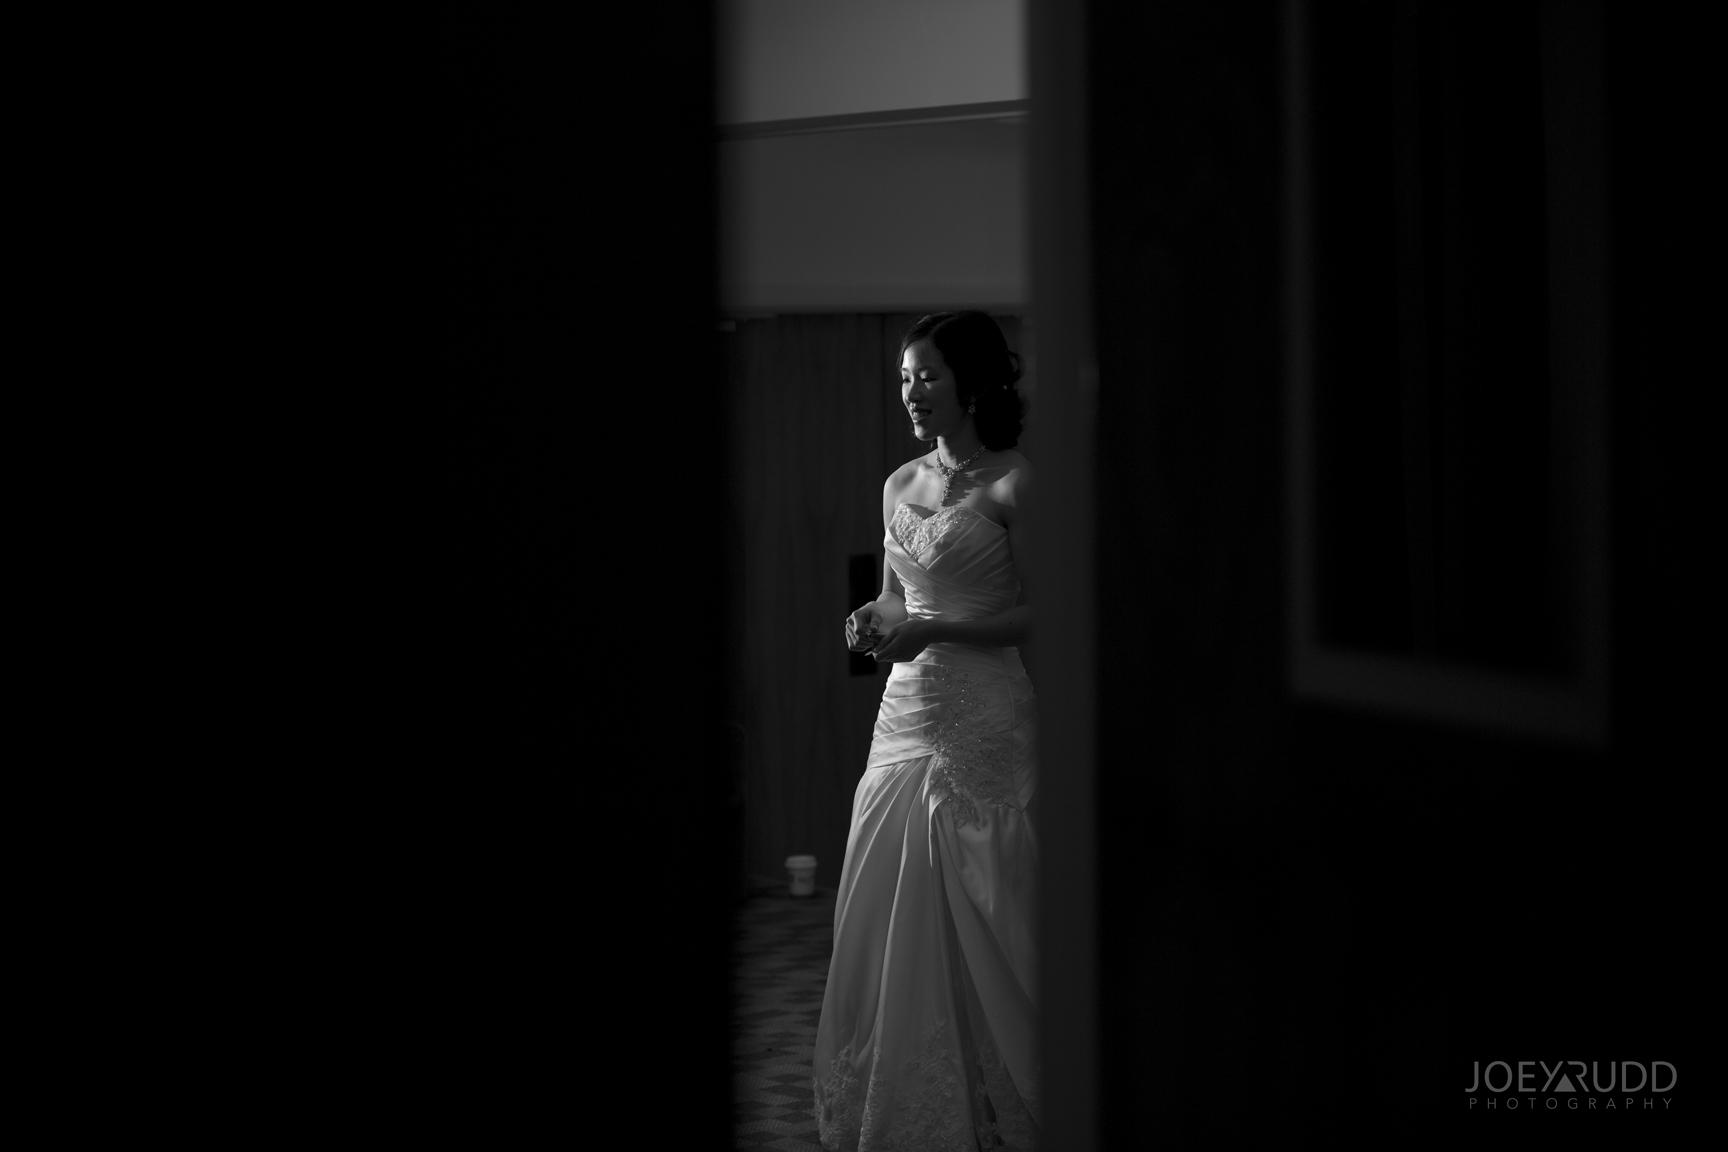 Dramatic Wedding Photography